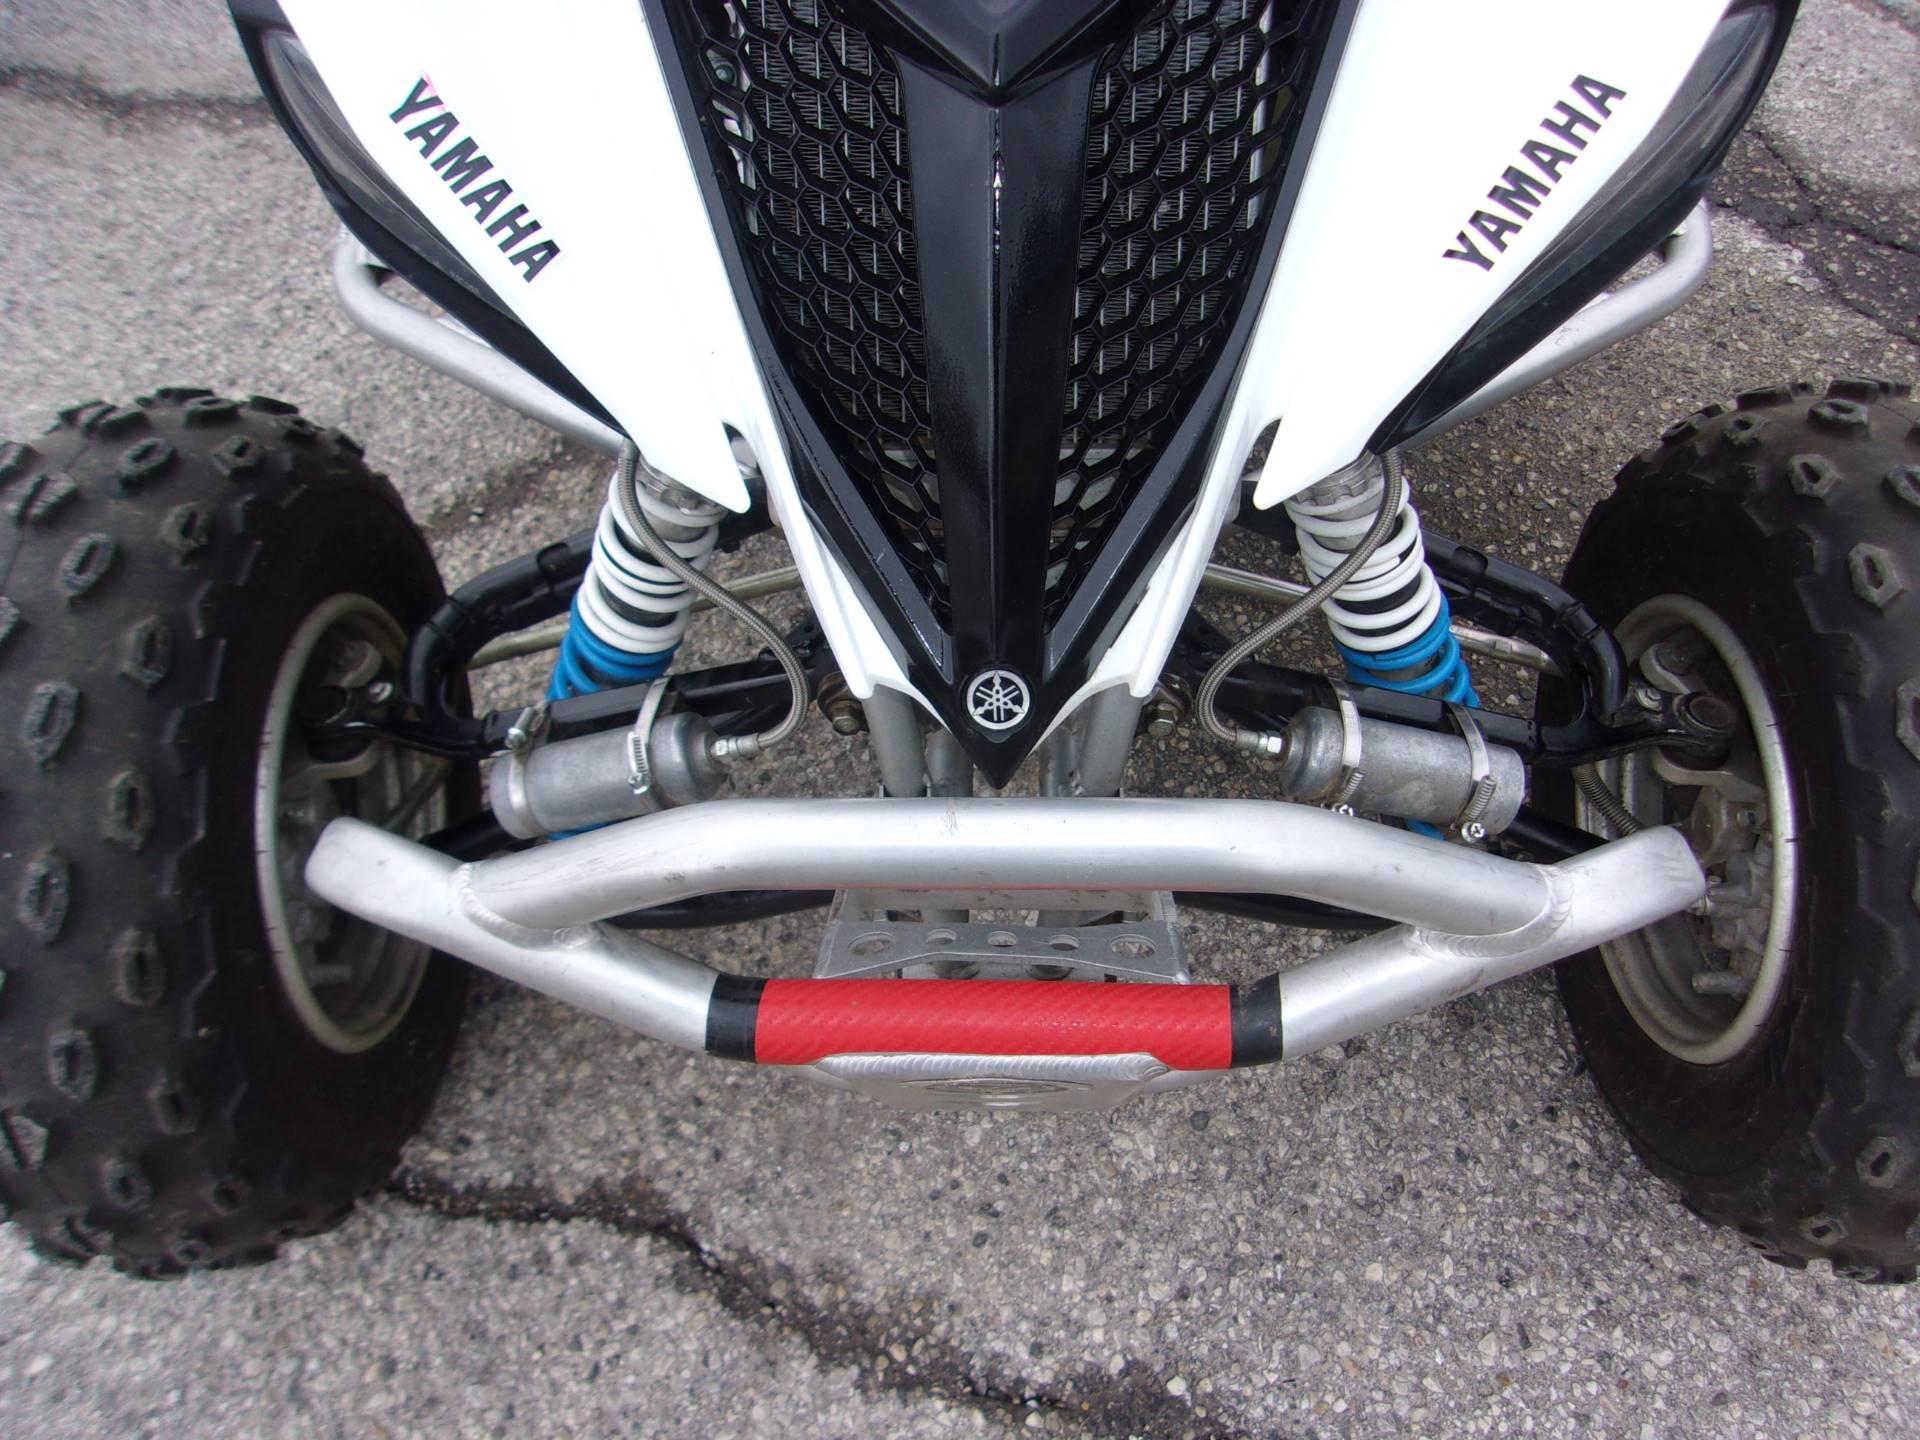 2012 Yamaha Raptor 700R 7